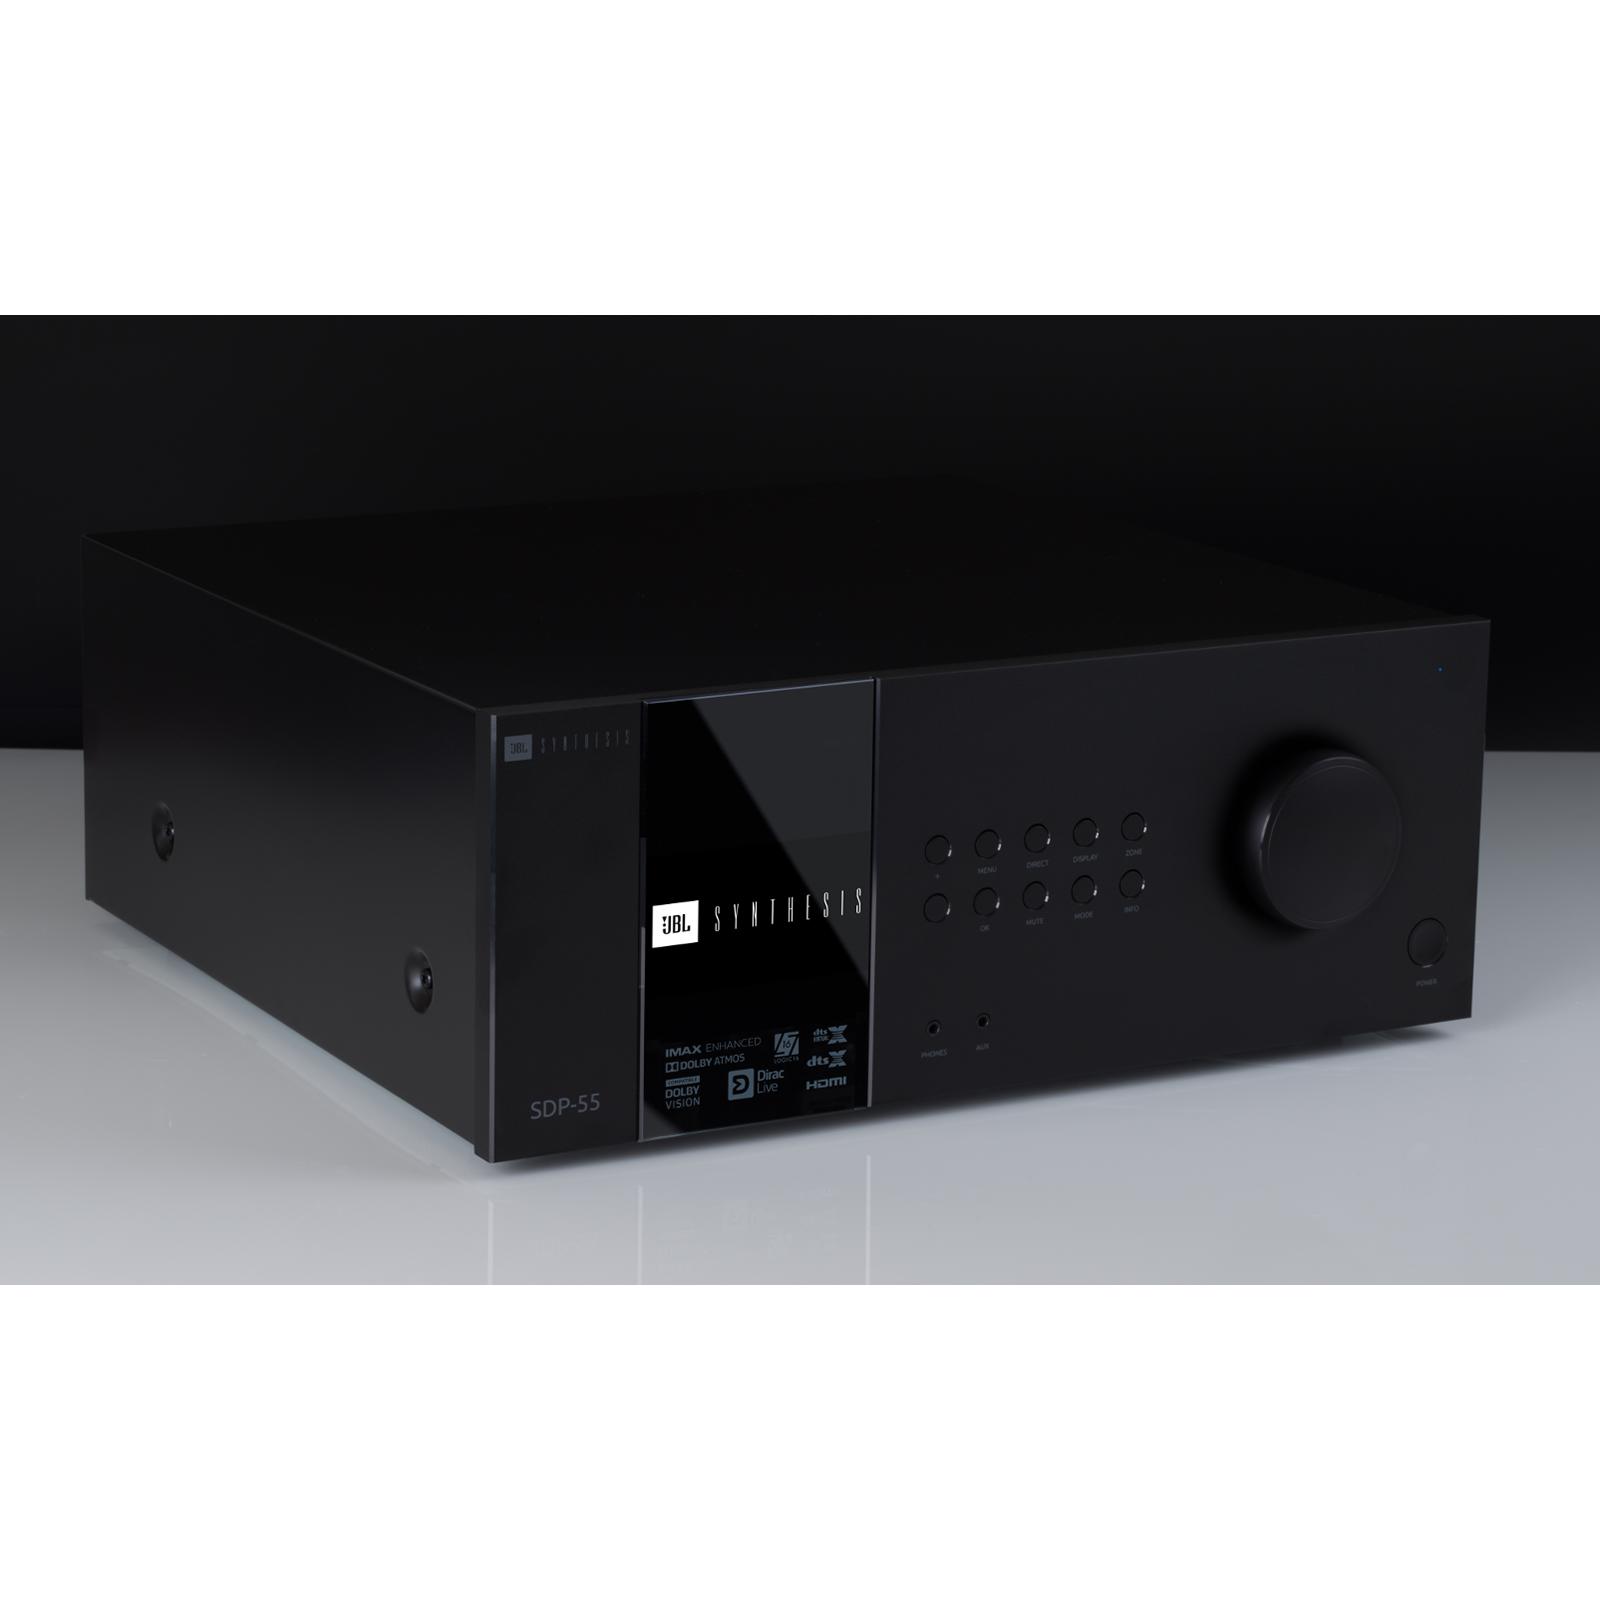 SDP-55 - Black - 16 Ch. Immersive Surround Sound Processor with Dante - Front